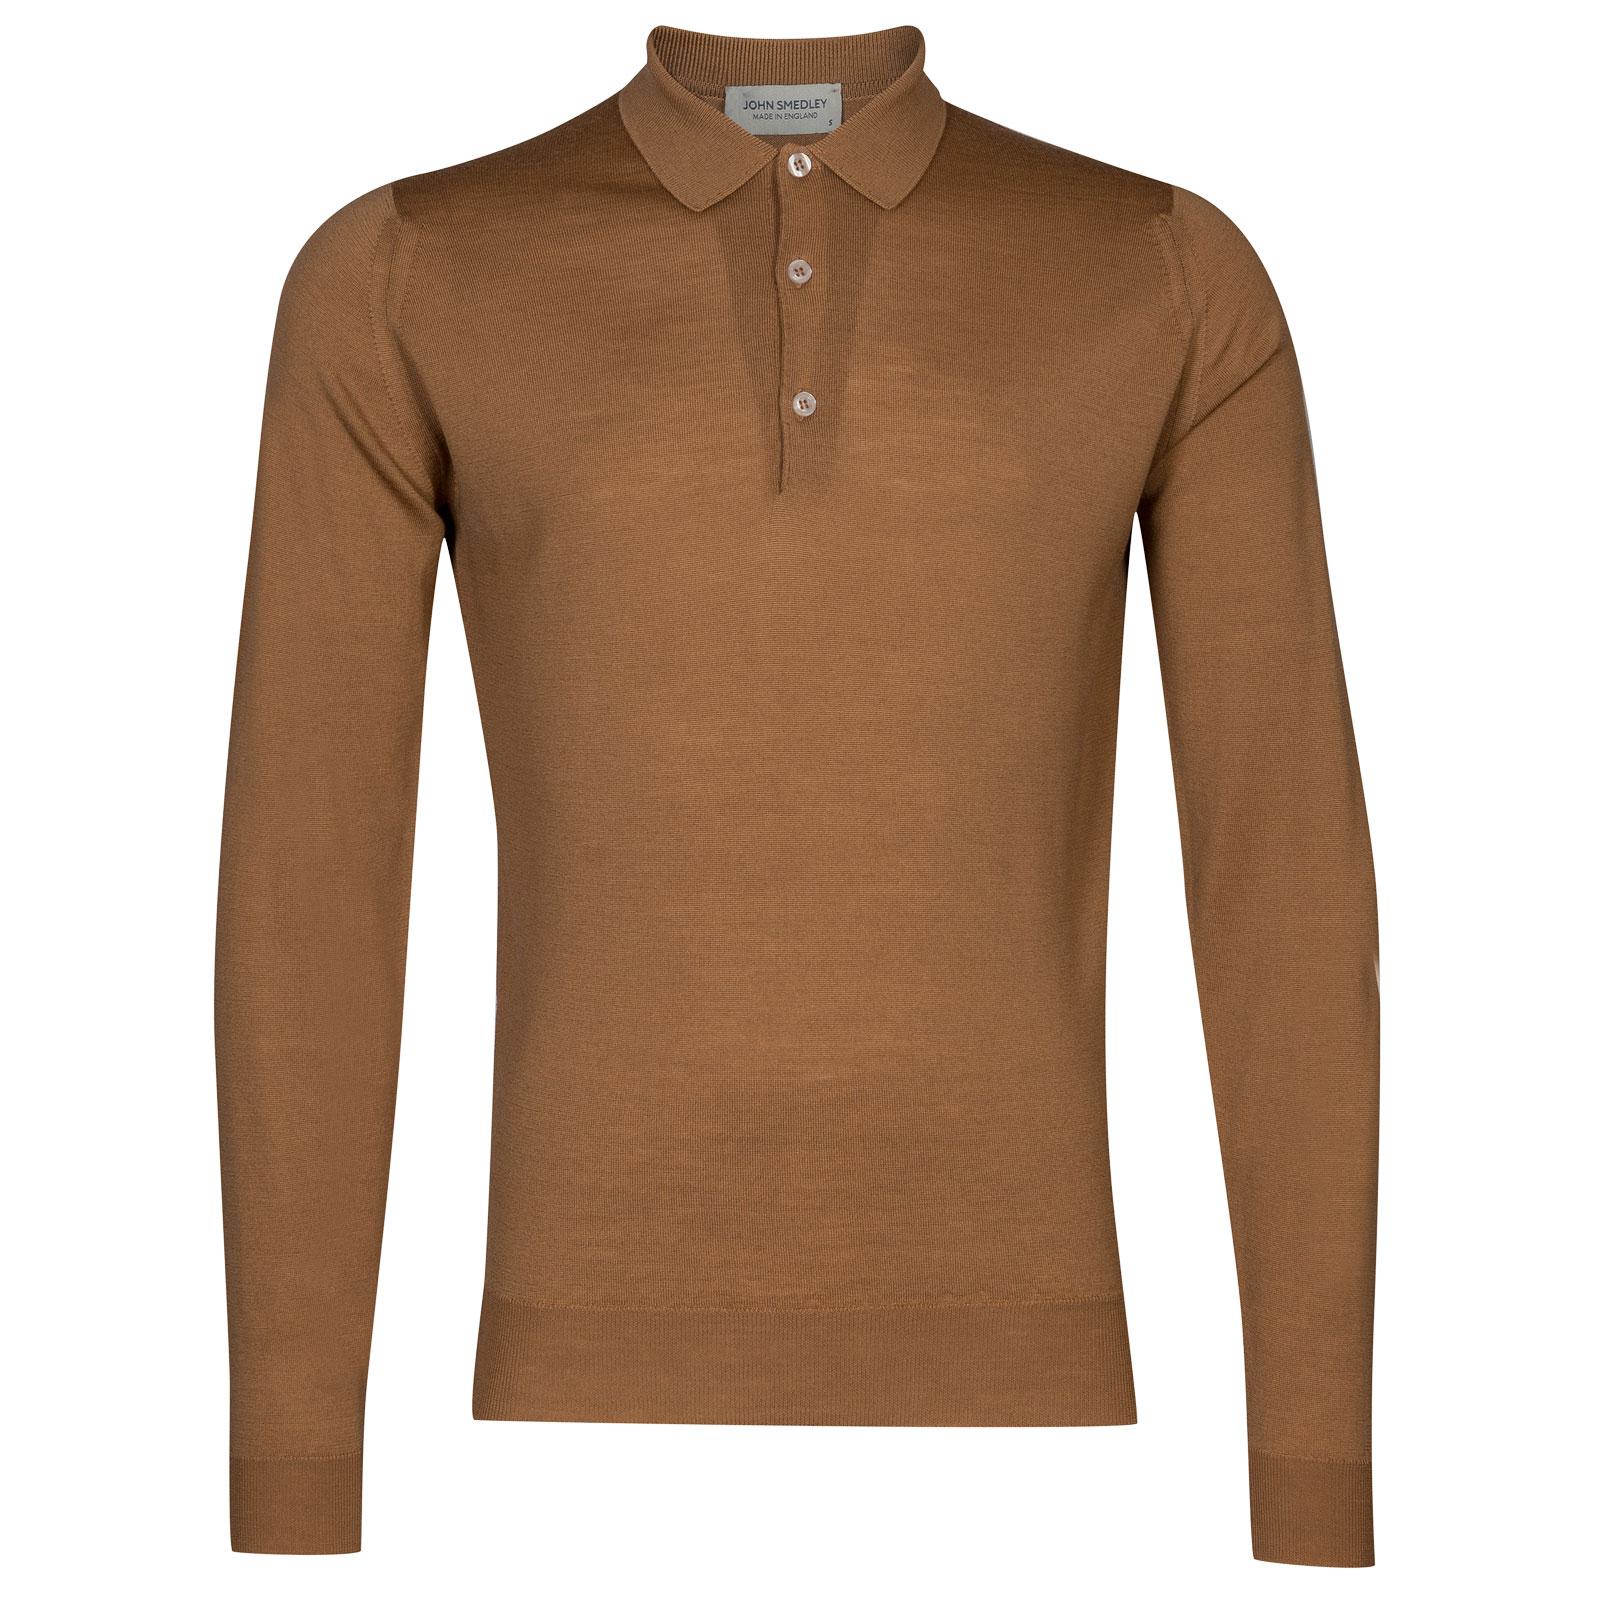 John Smedley belper Merino Wool Shirt in Camel-XL